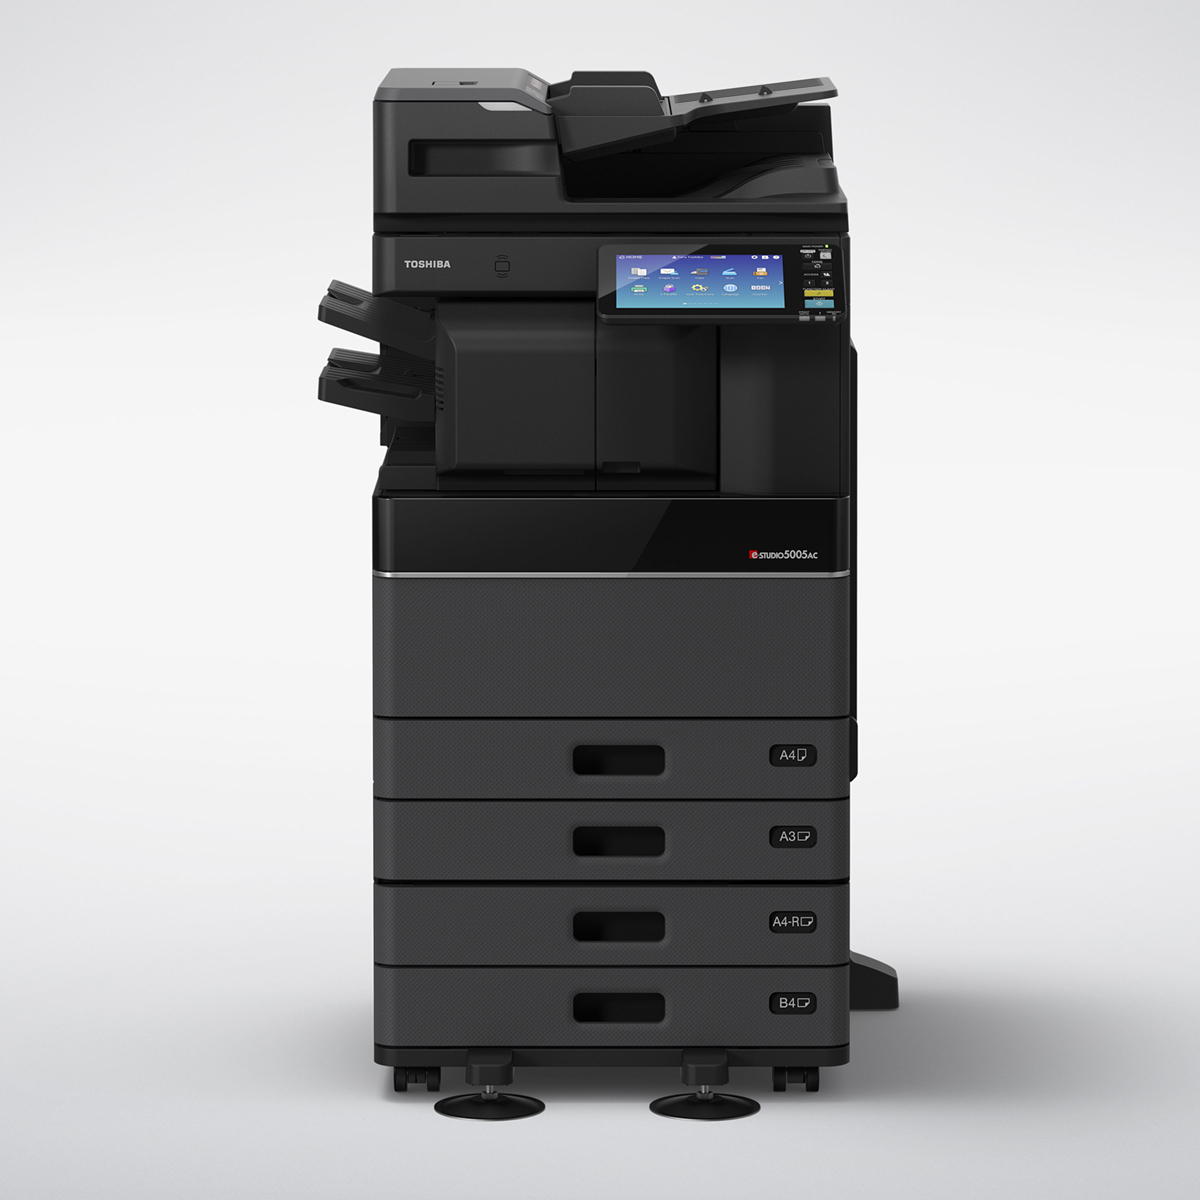 Toshiba e-studio 5005 ac serie.